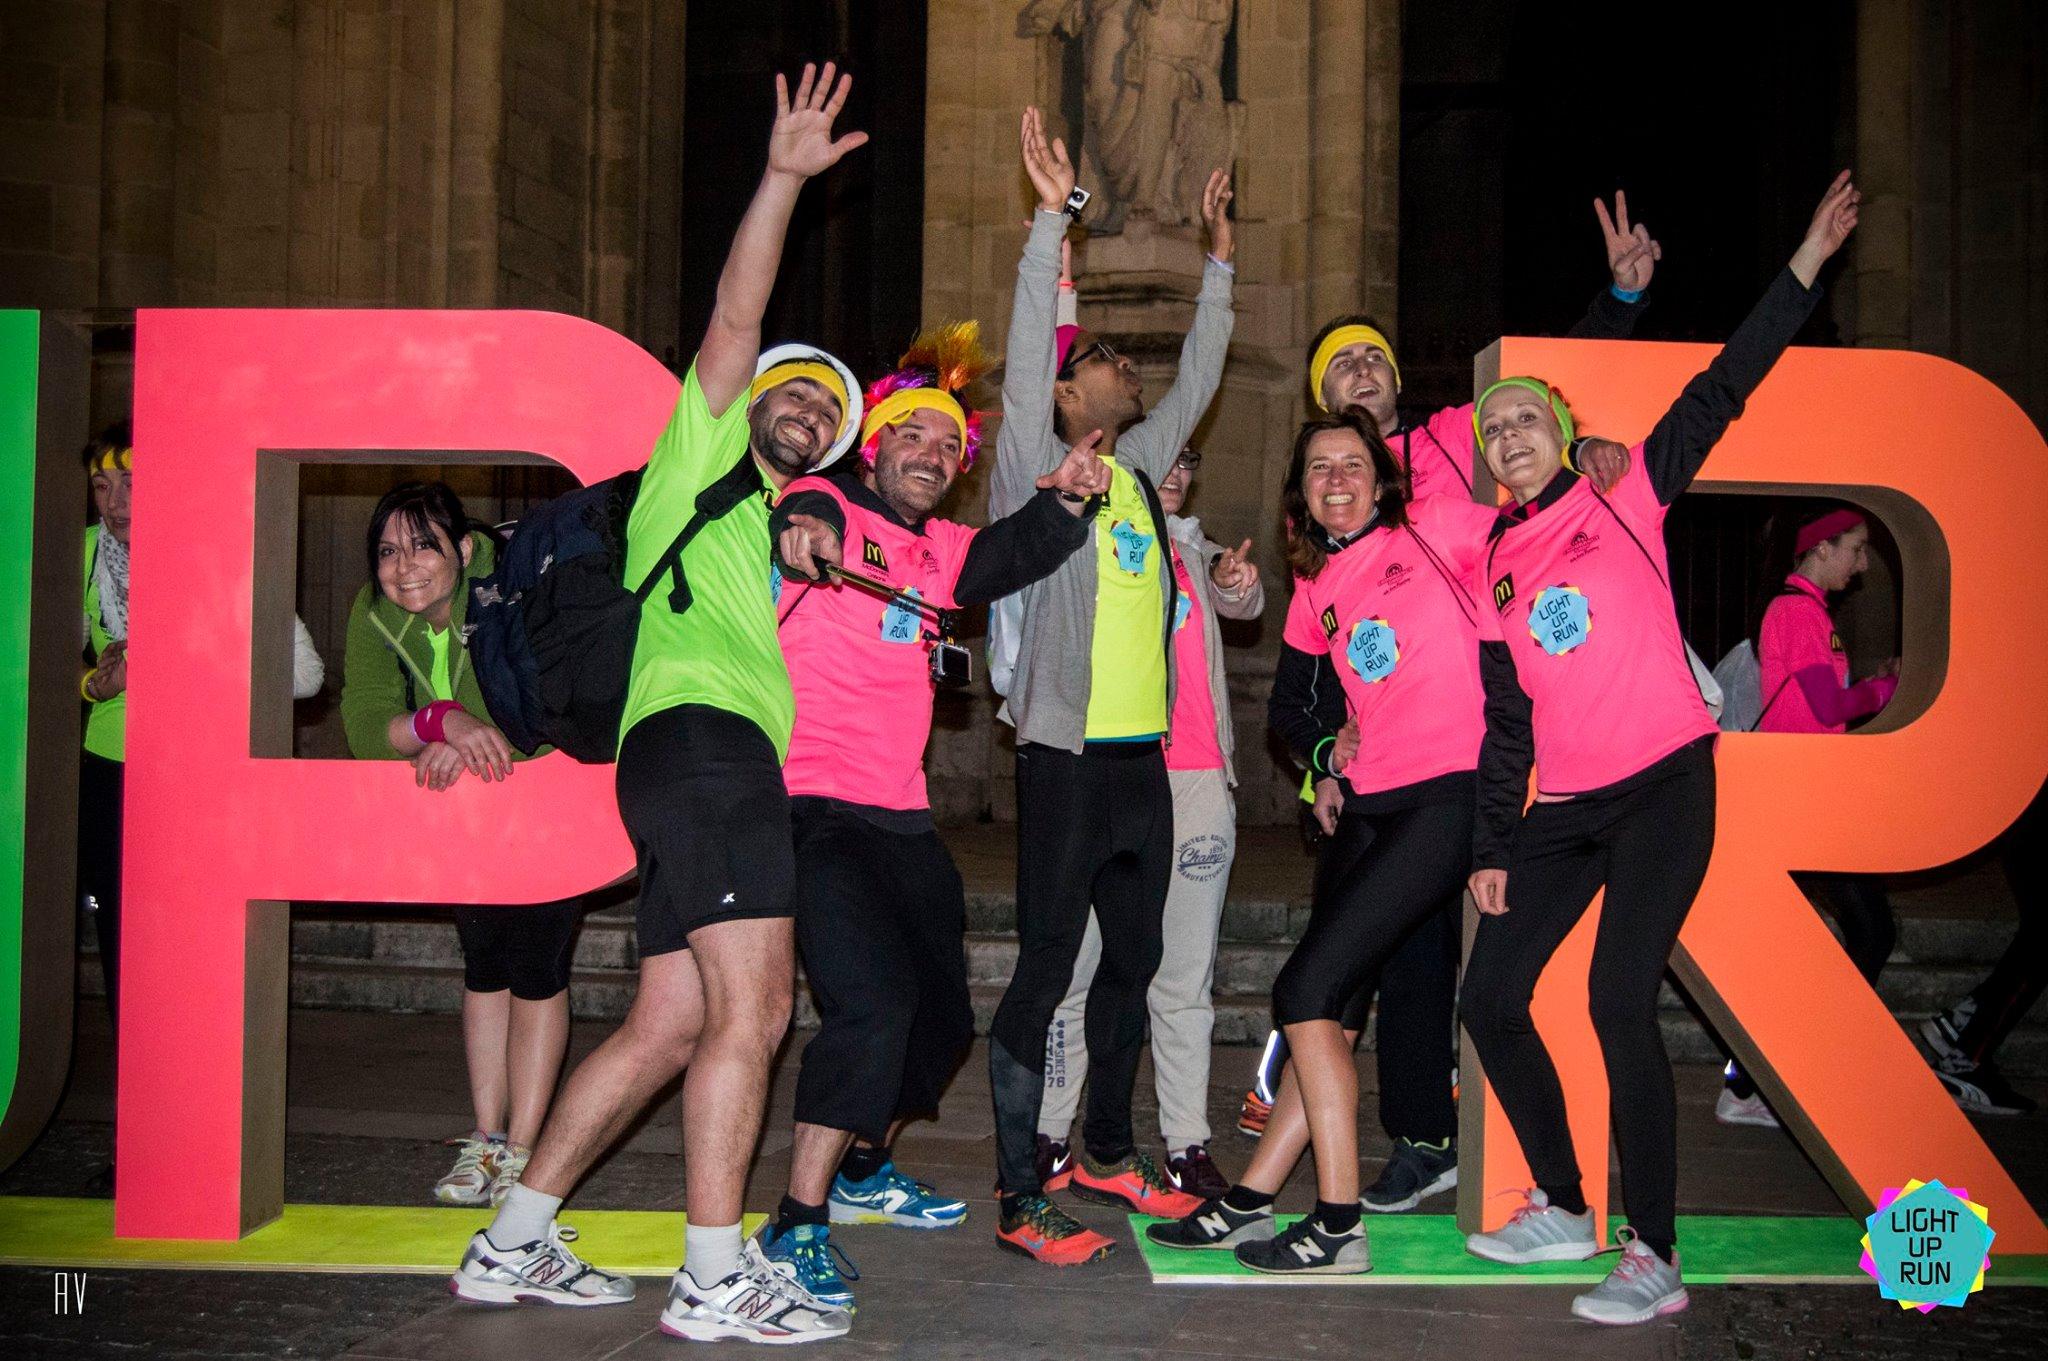 Course Light Up Run avec la Team Easyflyer